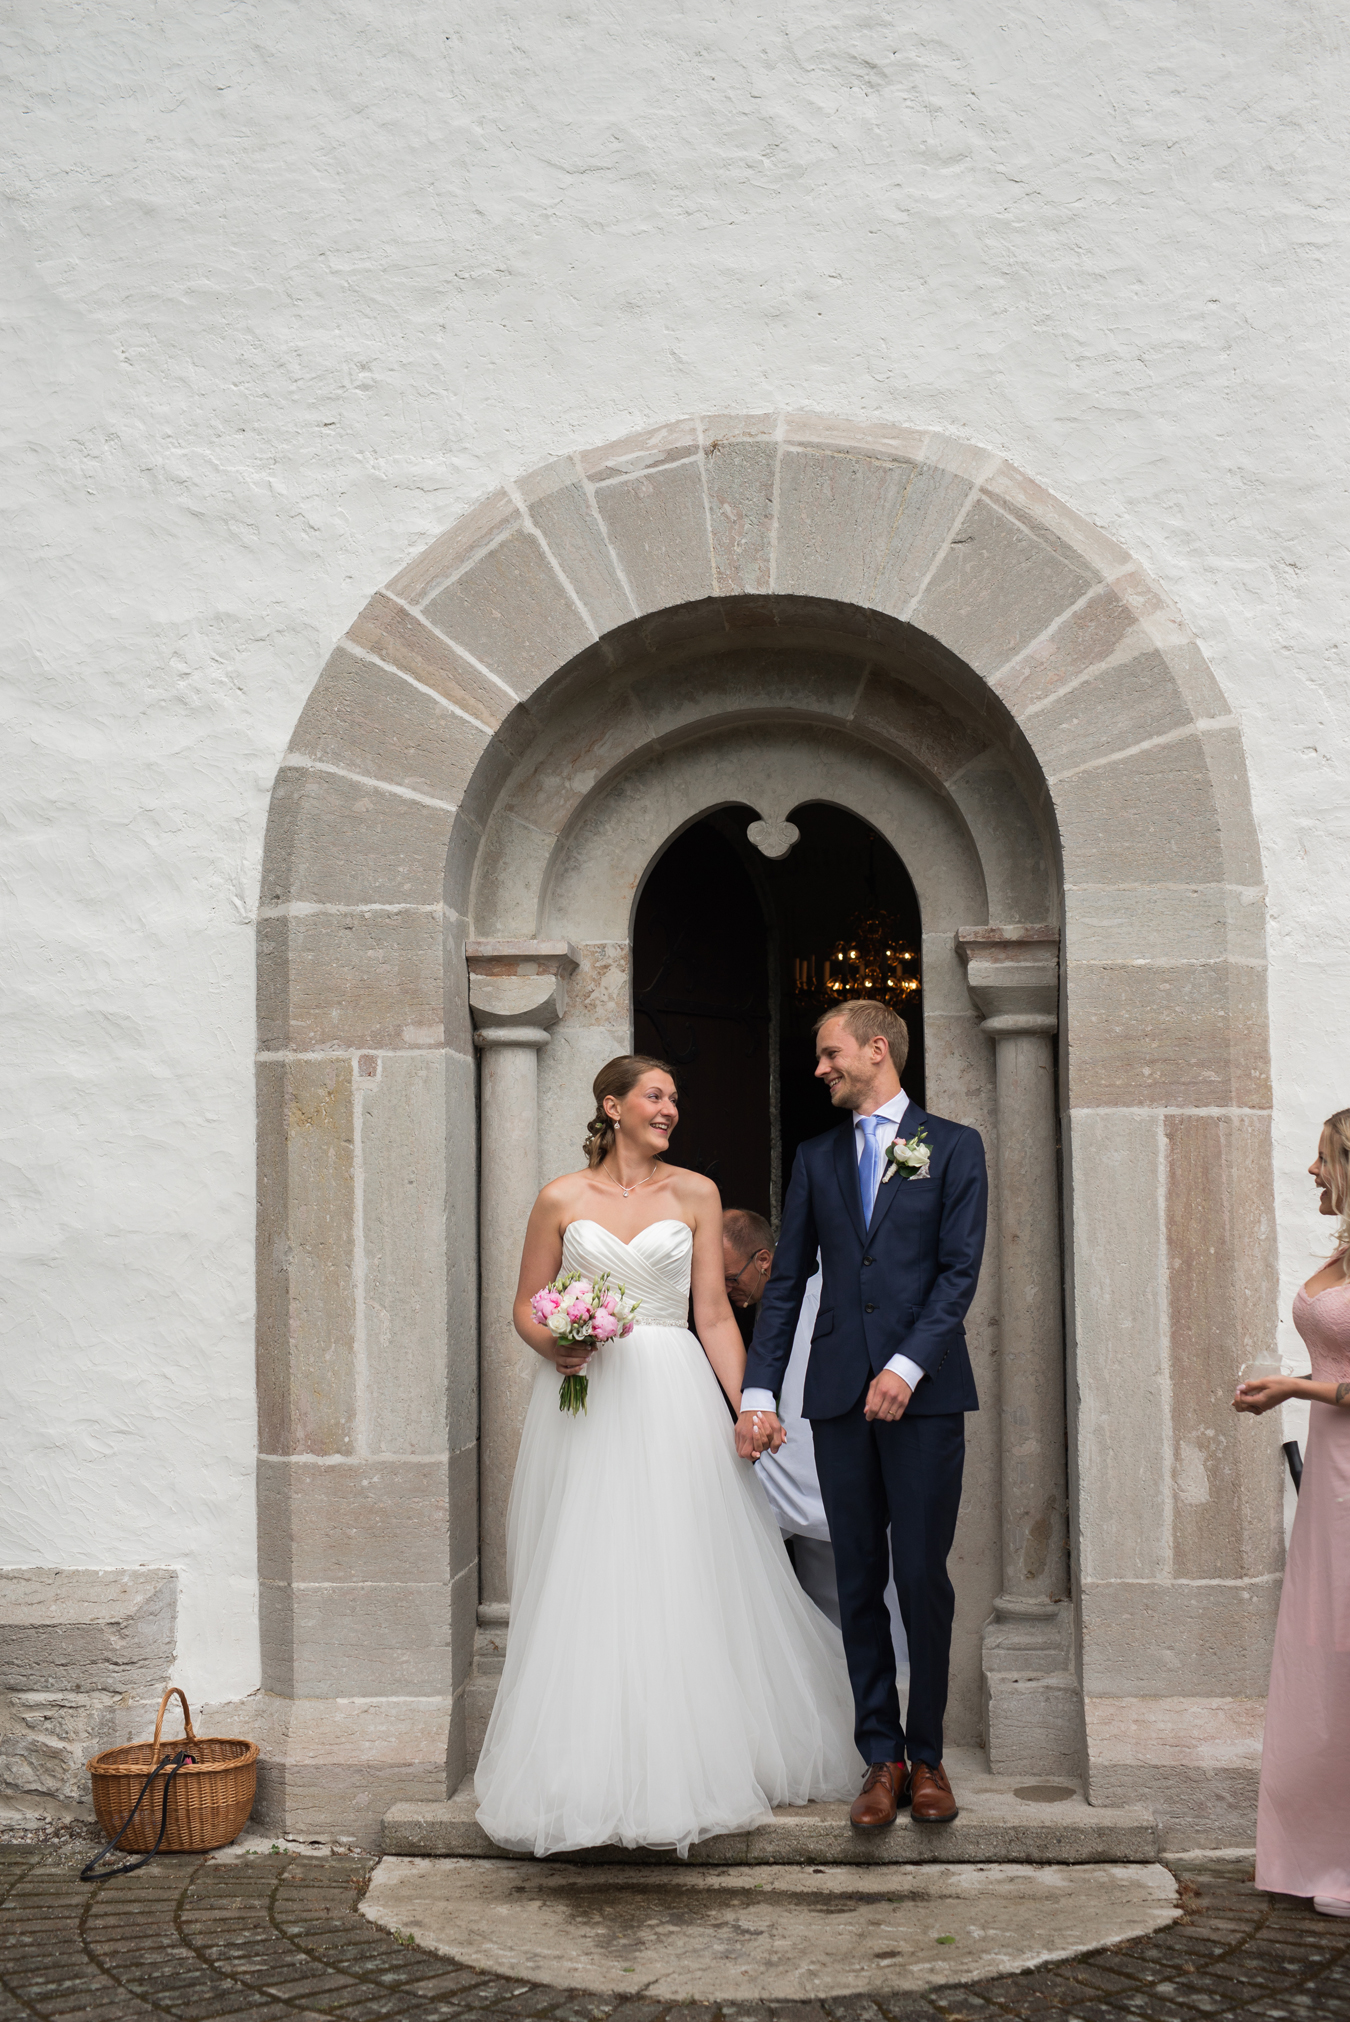 002-bröllopsfotograf-folhammar-gotland-neas-fotografi.jpg